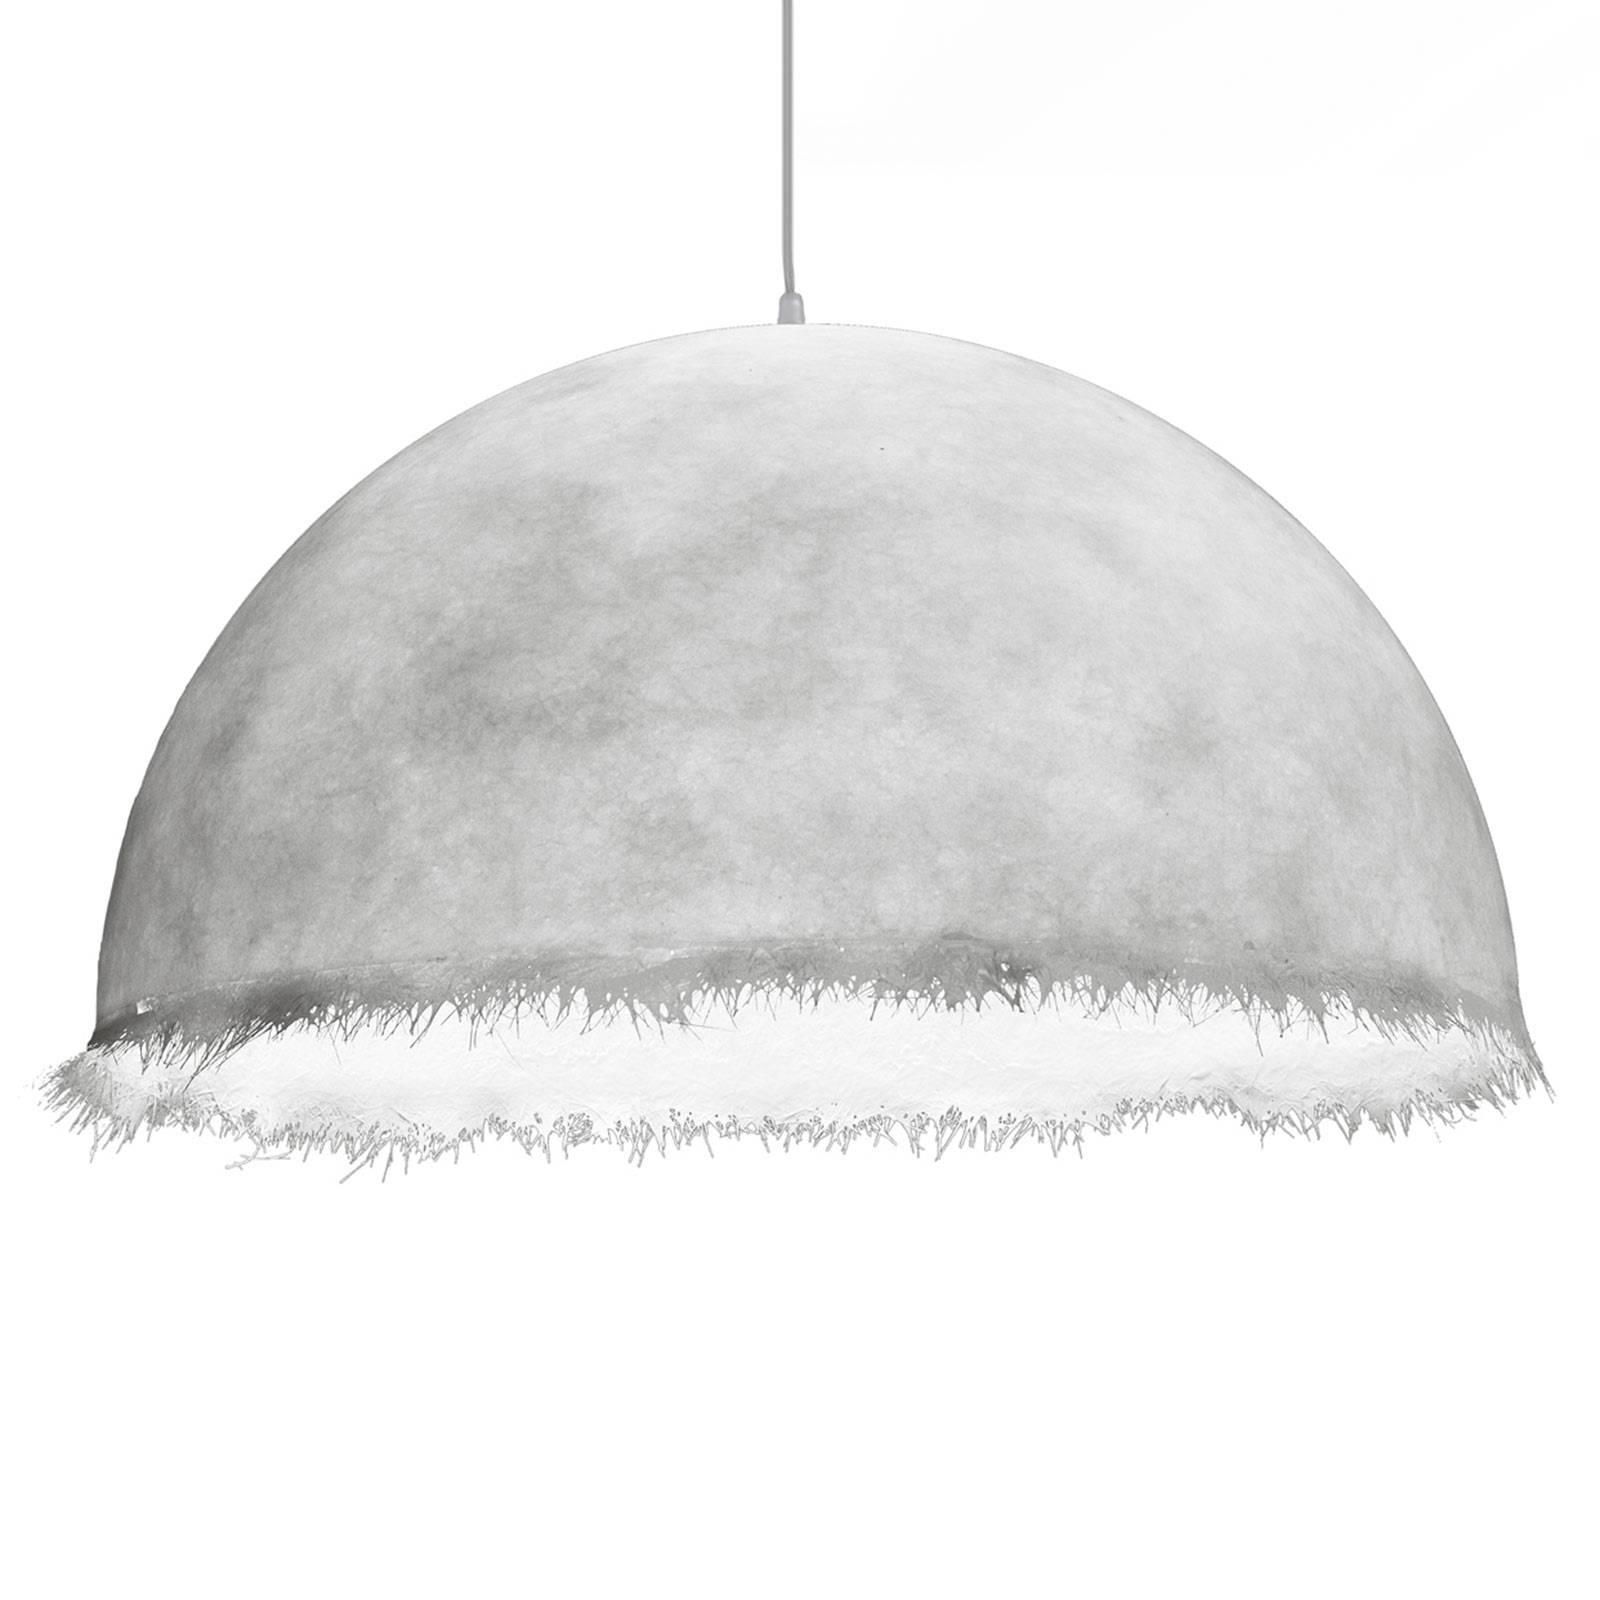 Karman Plancton -LED-ulkoriippuvalaisin, Ø 75 cm